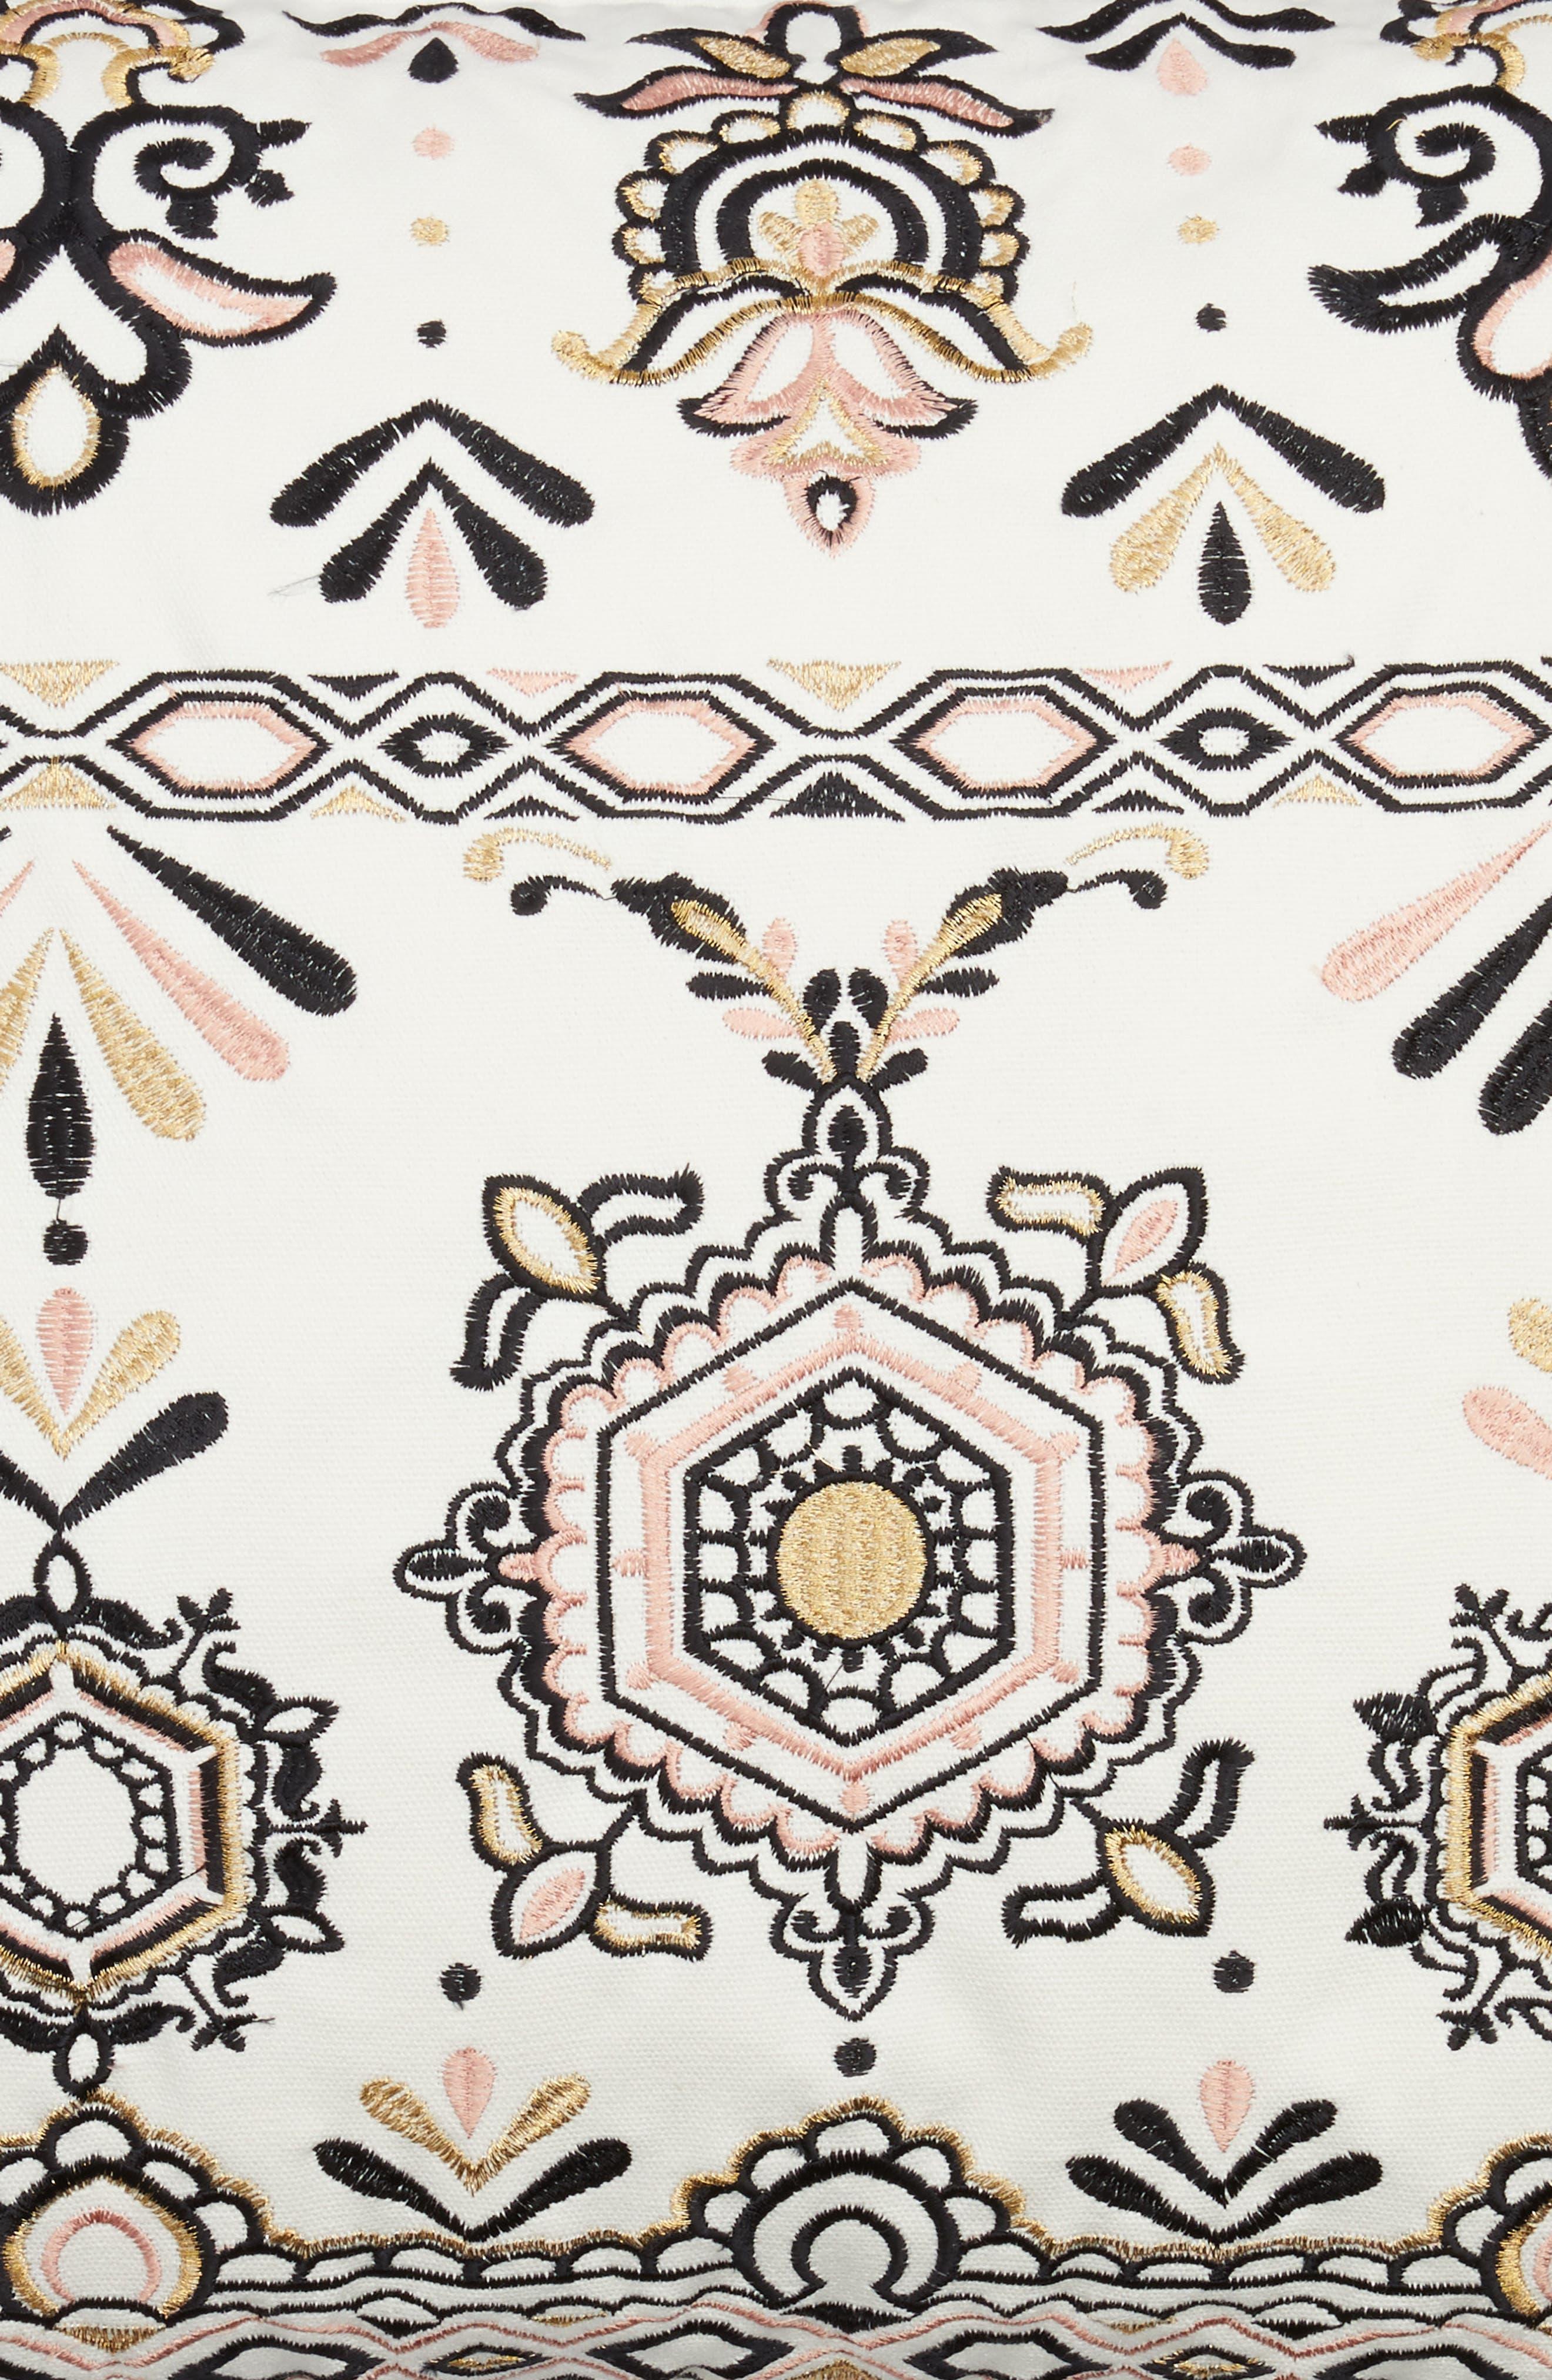 Embroidered Medallion Pillow,                             Alternate thumbnail 3, color,                             White